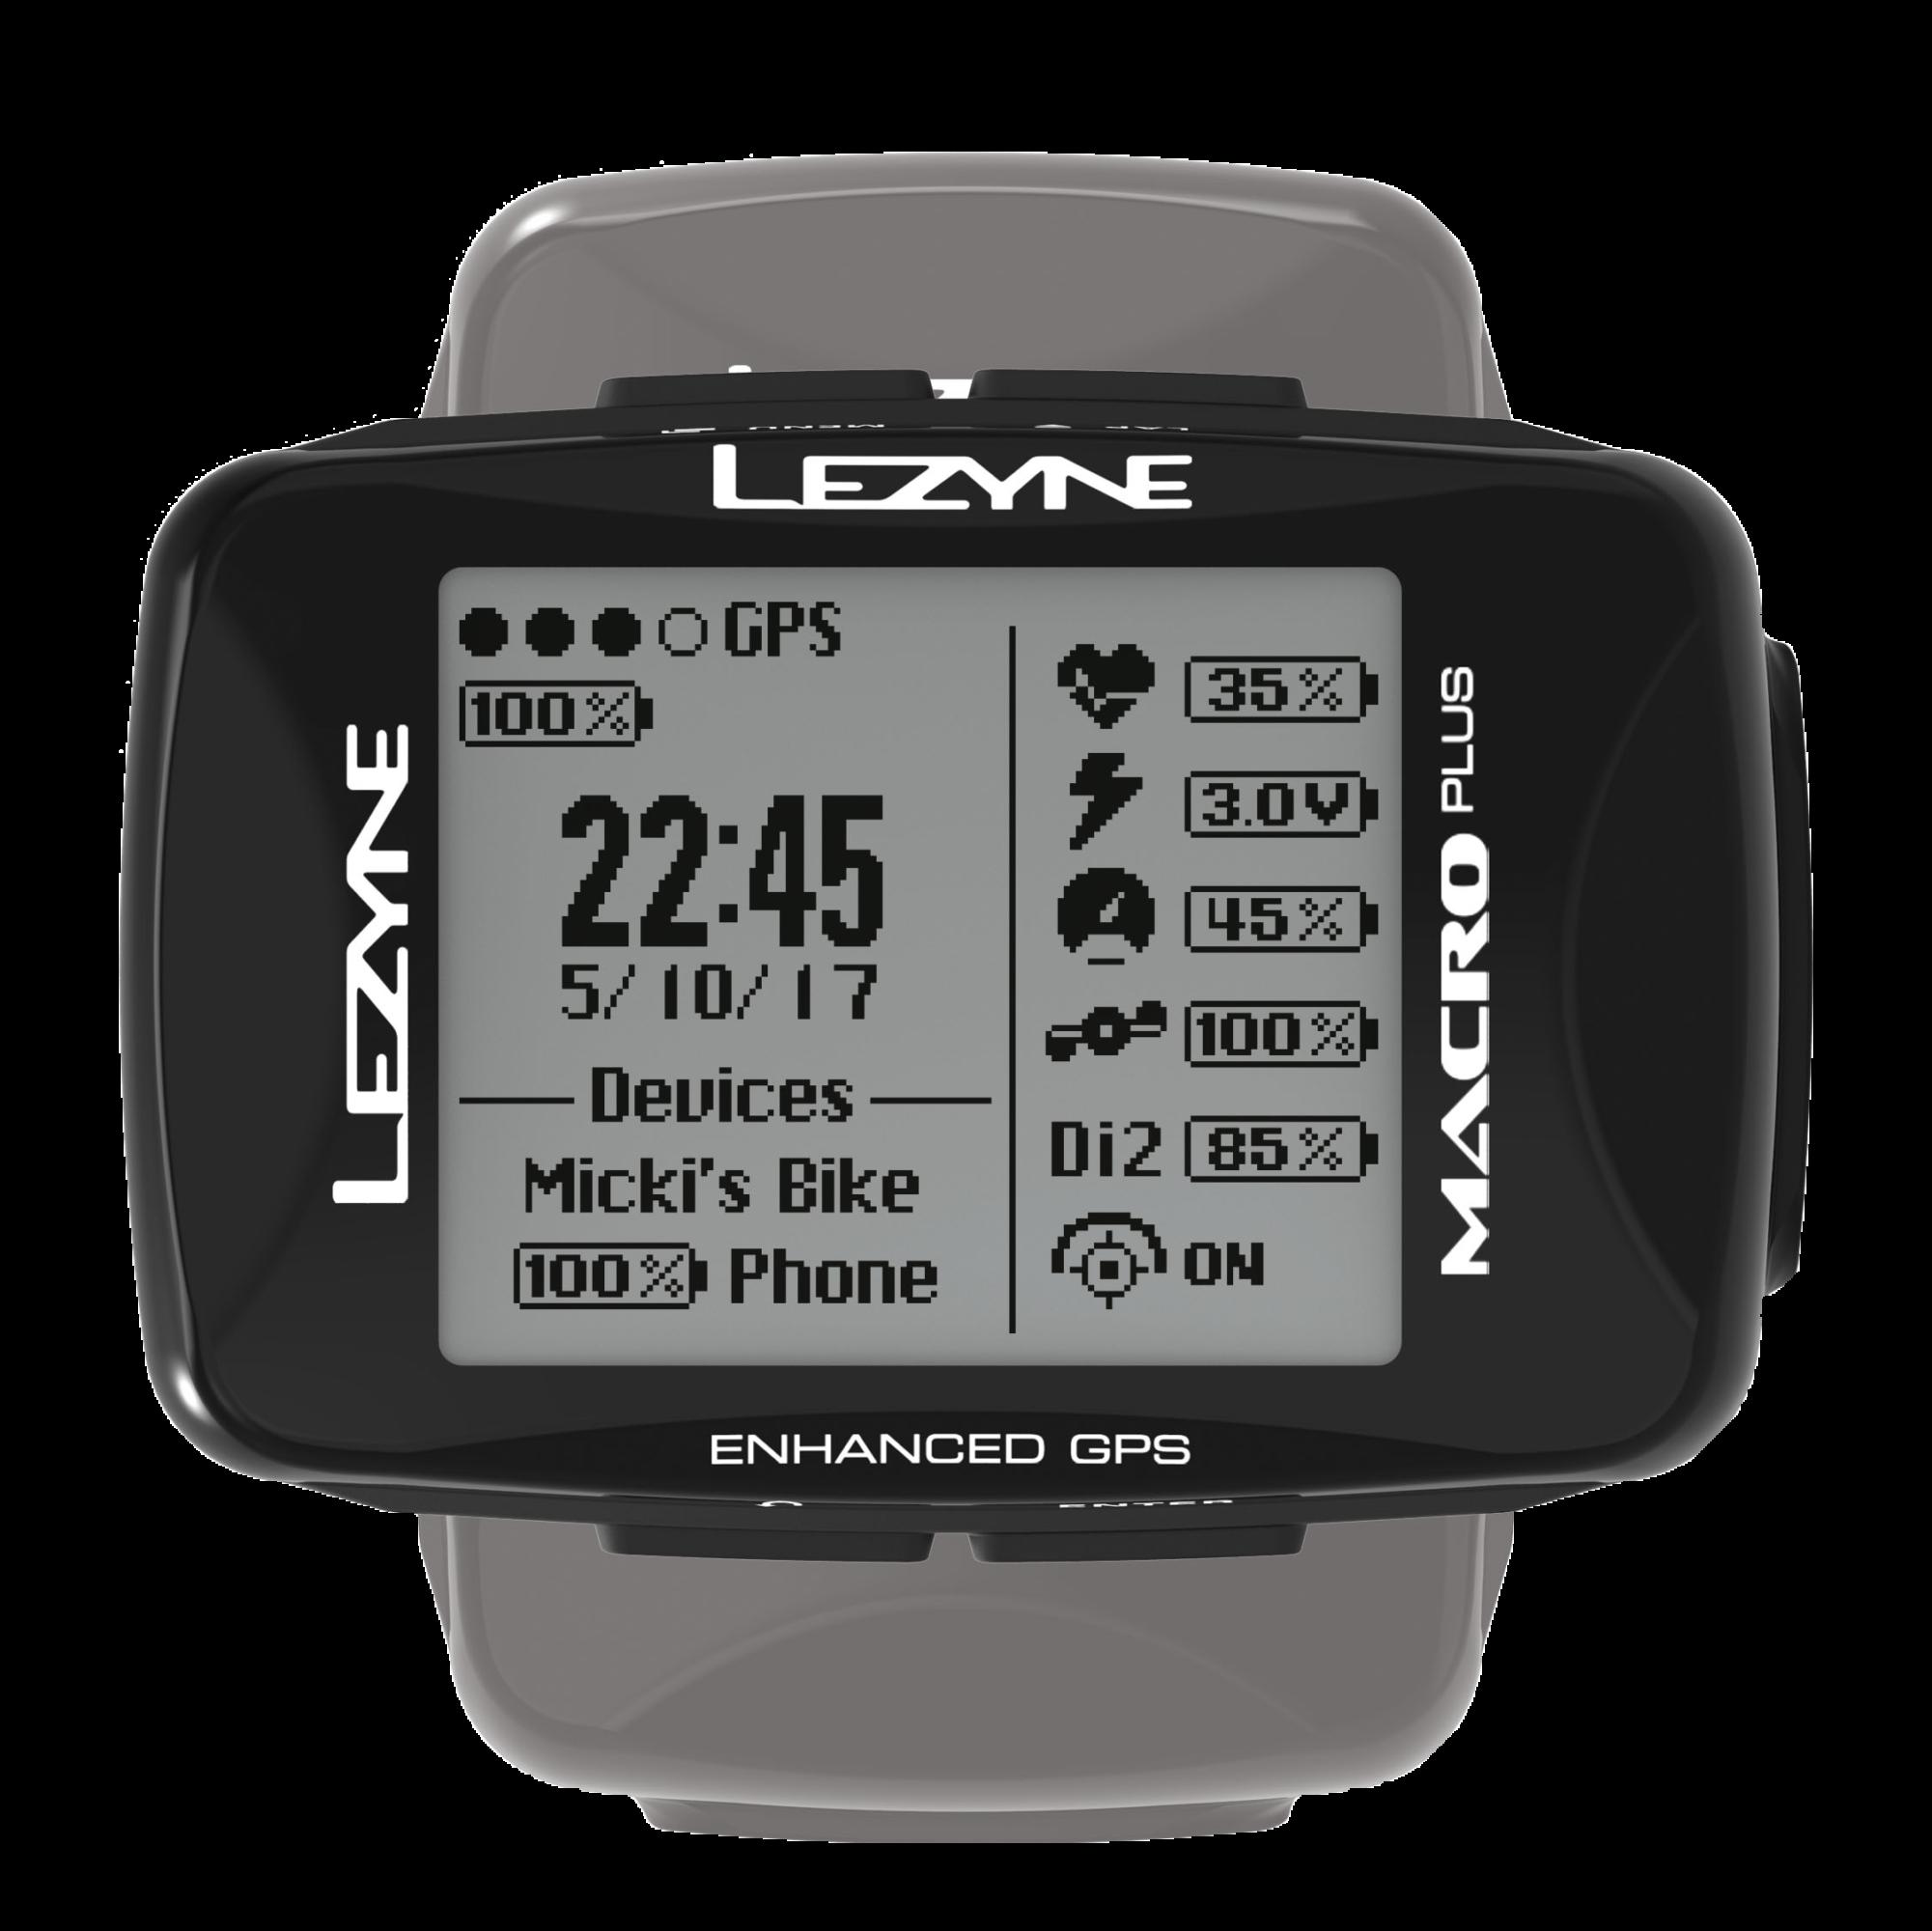 Lezyne Macro Plus GPS Fietscomputer abonnements aanbieding 2